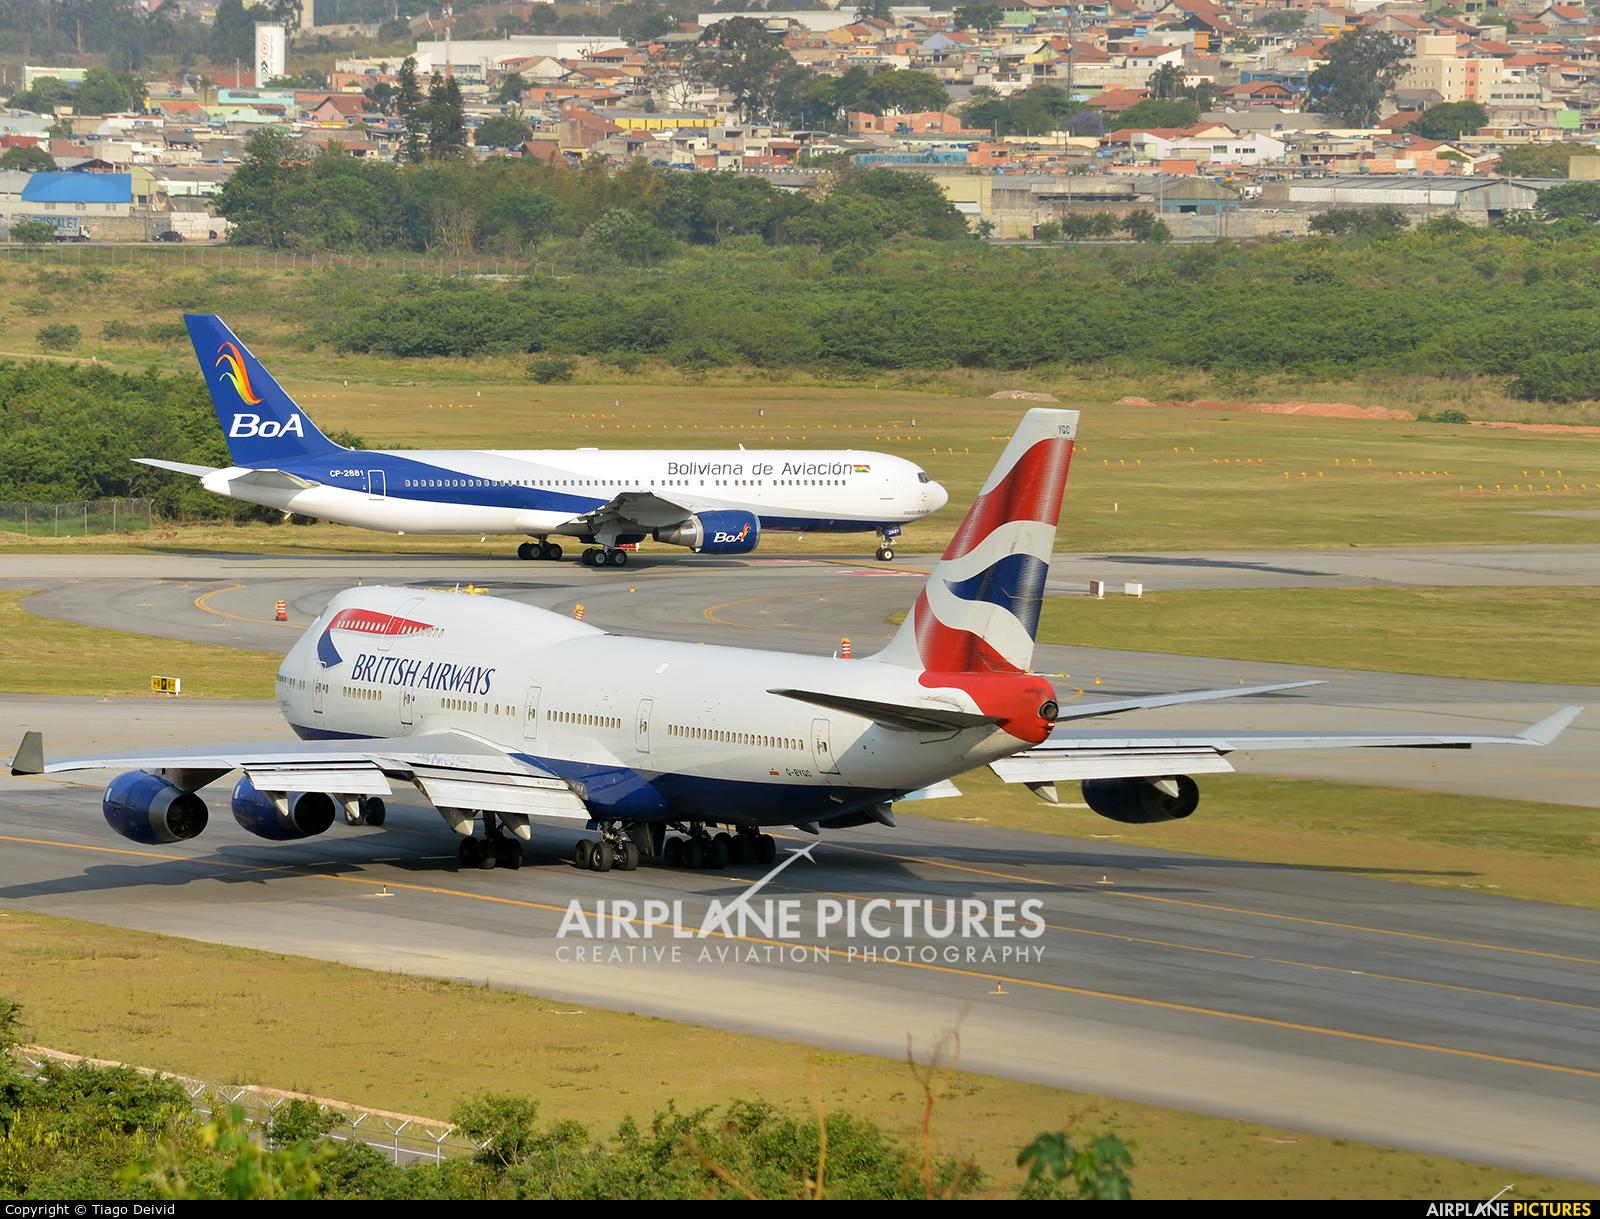 British Airways G-BYGC aircraft at São Paulo - Guarulhos